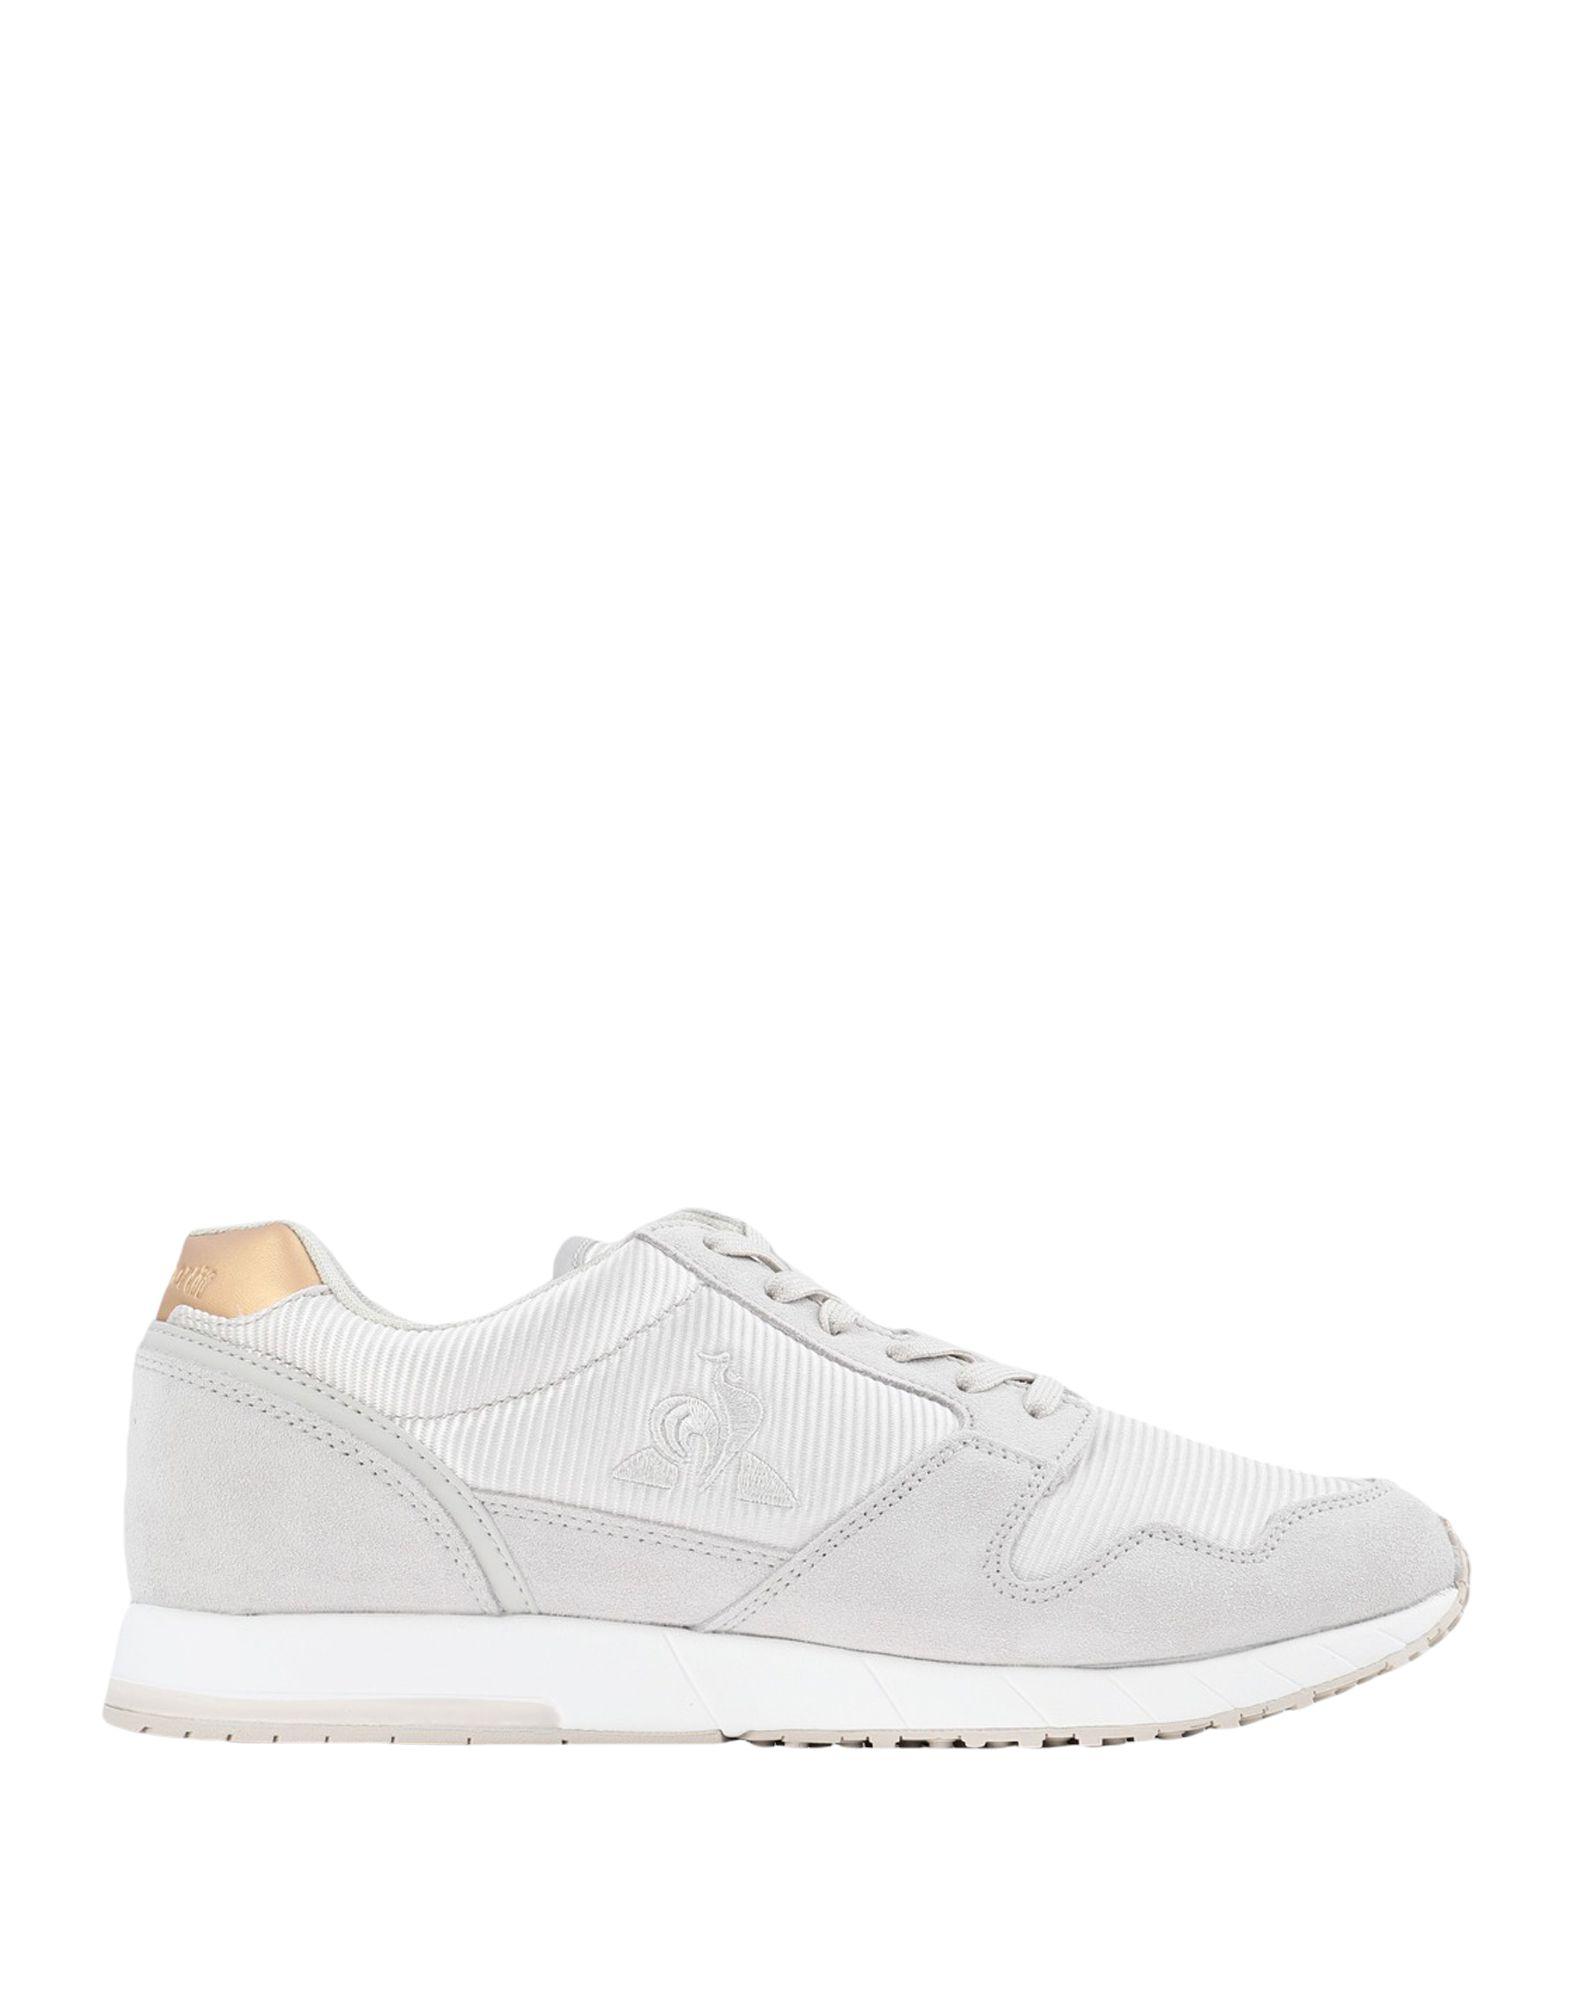 LE COQ SPORTIF Низкие кеды и кроссовки кроссовки le coq sportif arthur ashe luxe optical white